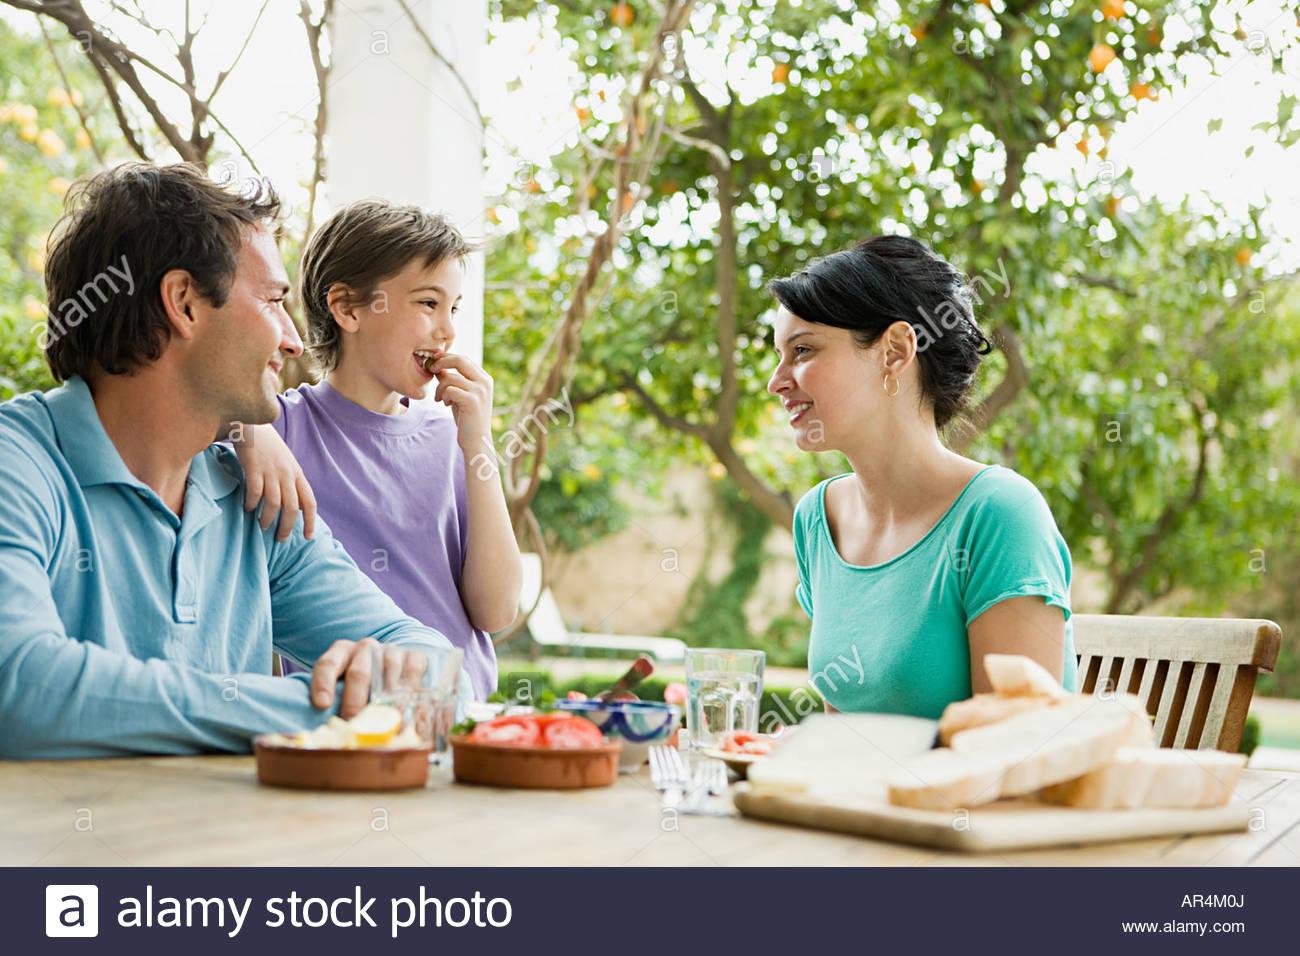 Family having an alfresco meal - Stock Image